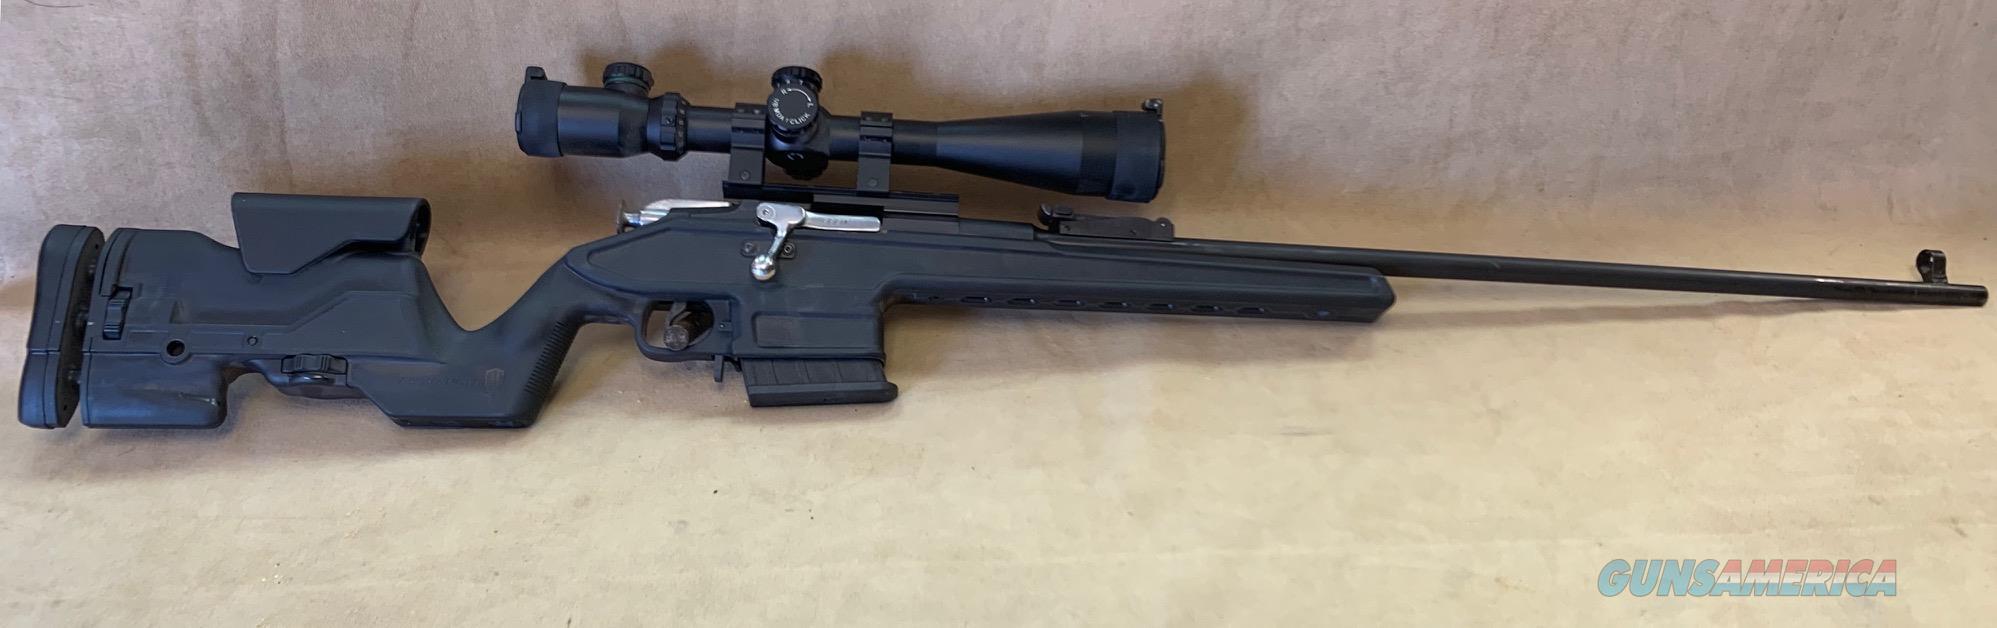 Tula Mosin Nagant Model 91 7.62x54R Consignment  Guns > Rifles > Mosin-Nagant Rifles/Carbines